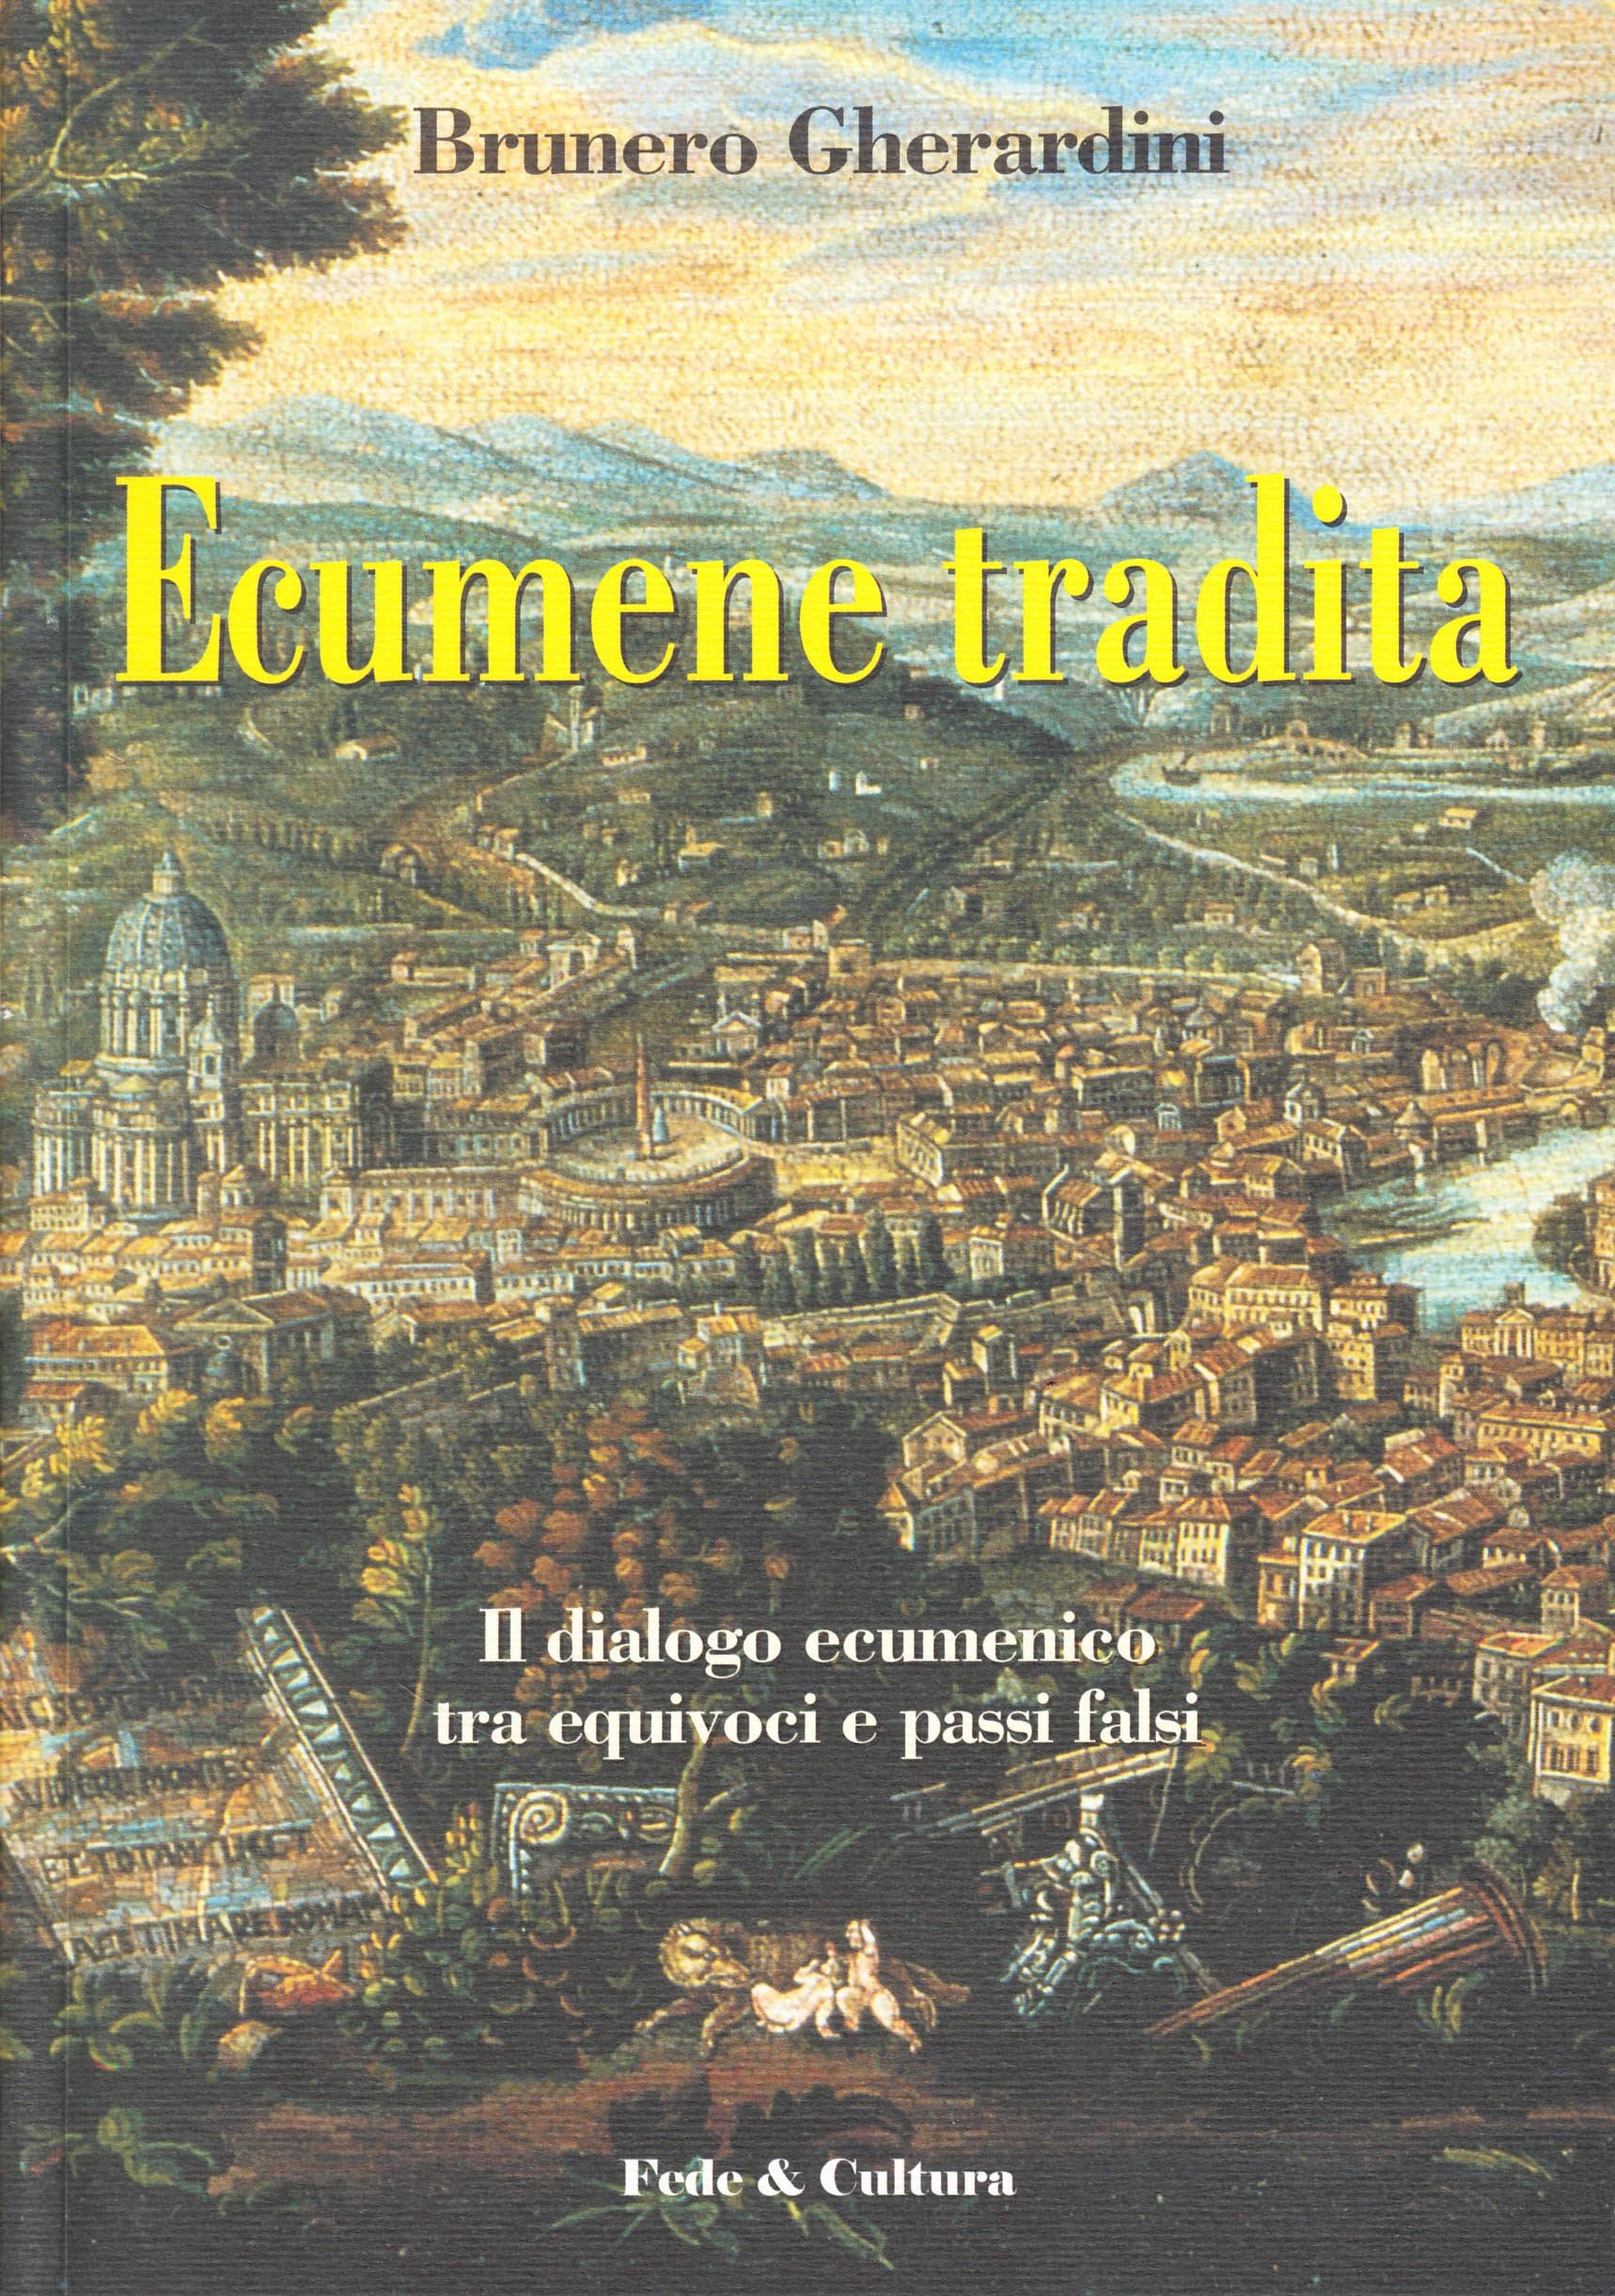 Ecumene tradita. Il dialogo ecumenico tra equivoci e passi falsi